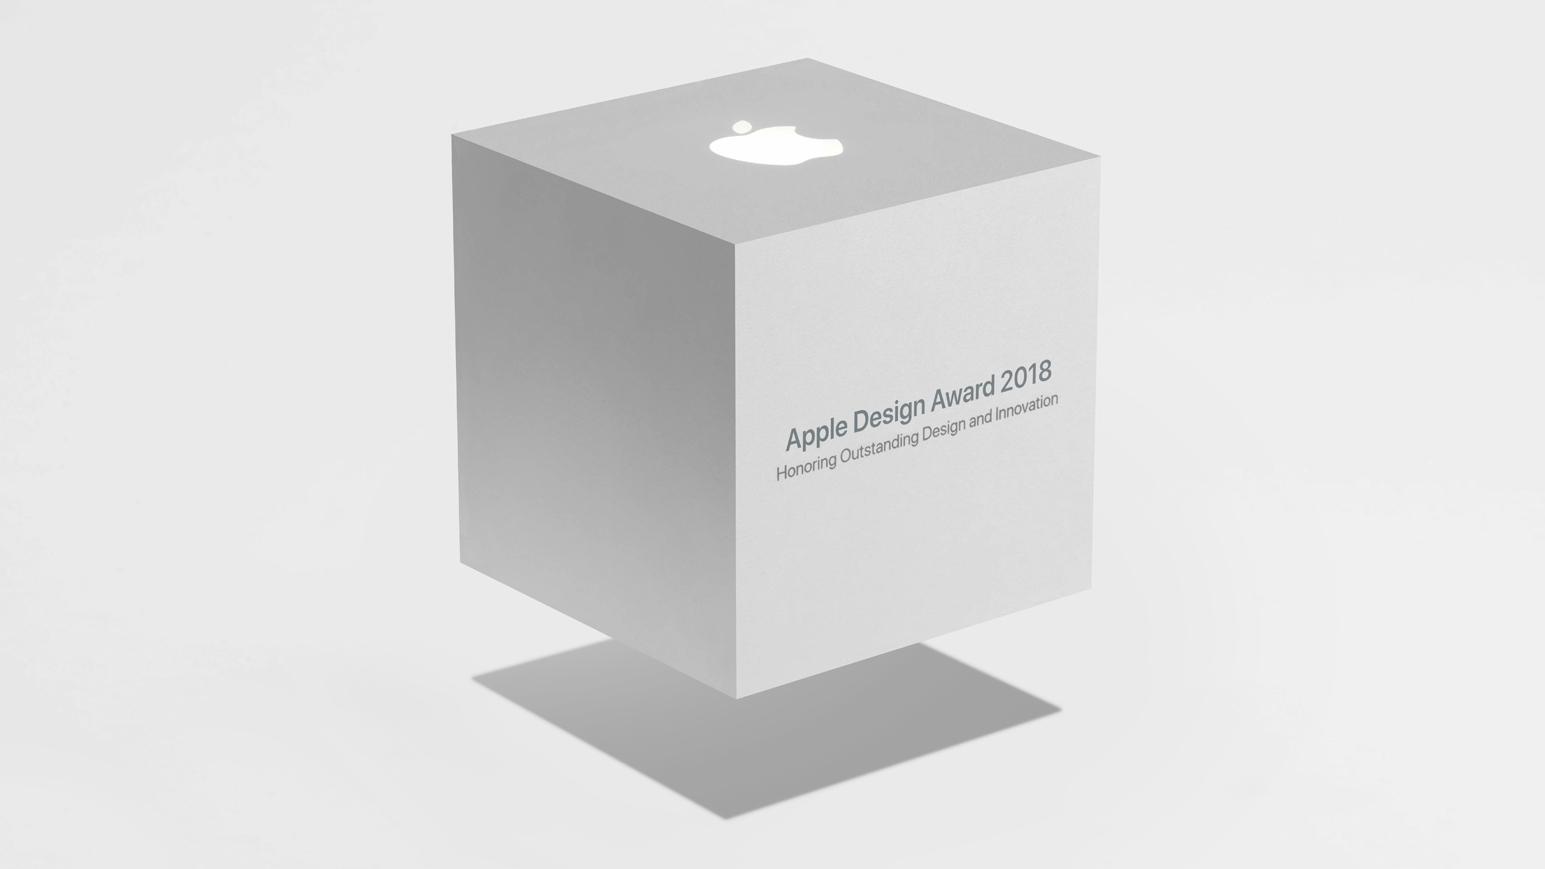 Apple_Design_Awards_06072018.jpg